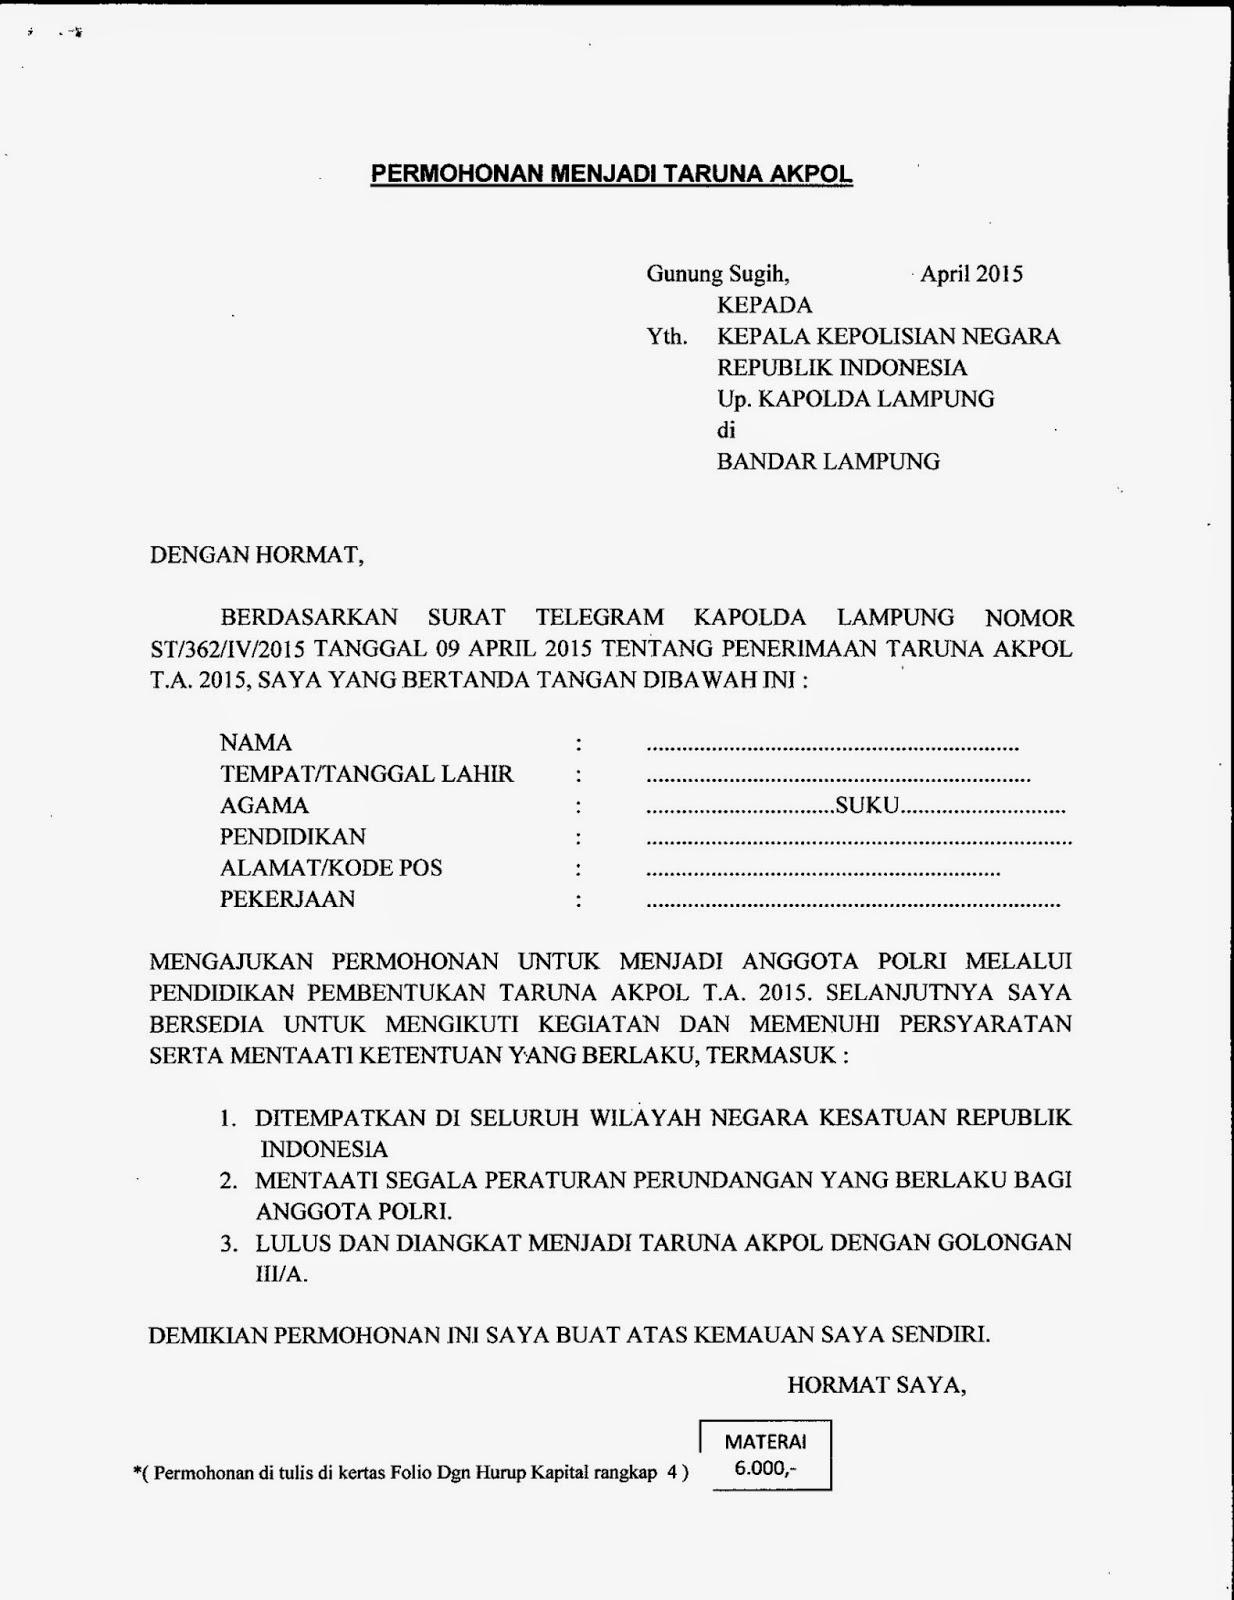 Polres Lampung Tengah Contoh Format Surat Permohonan Menjadi